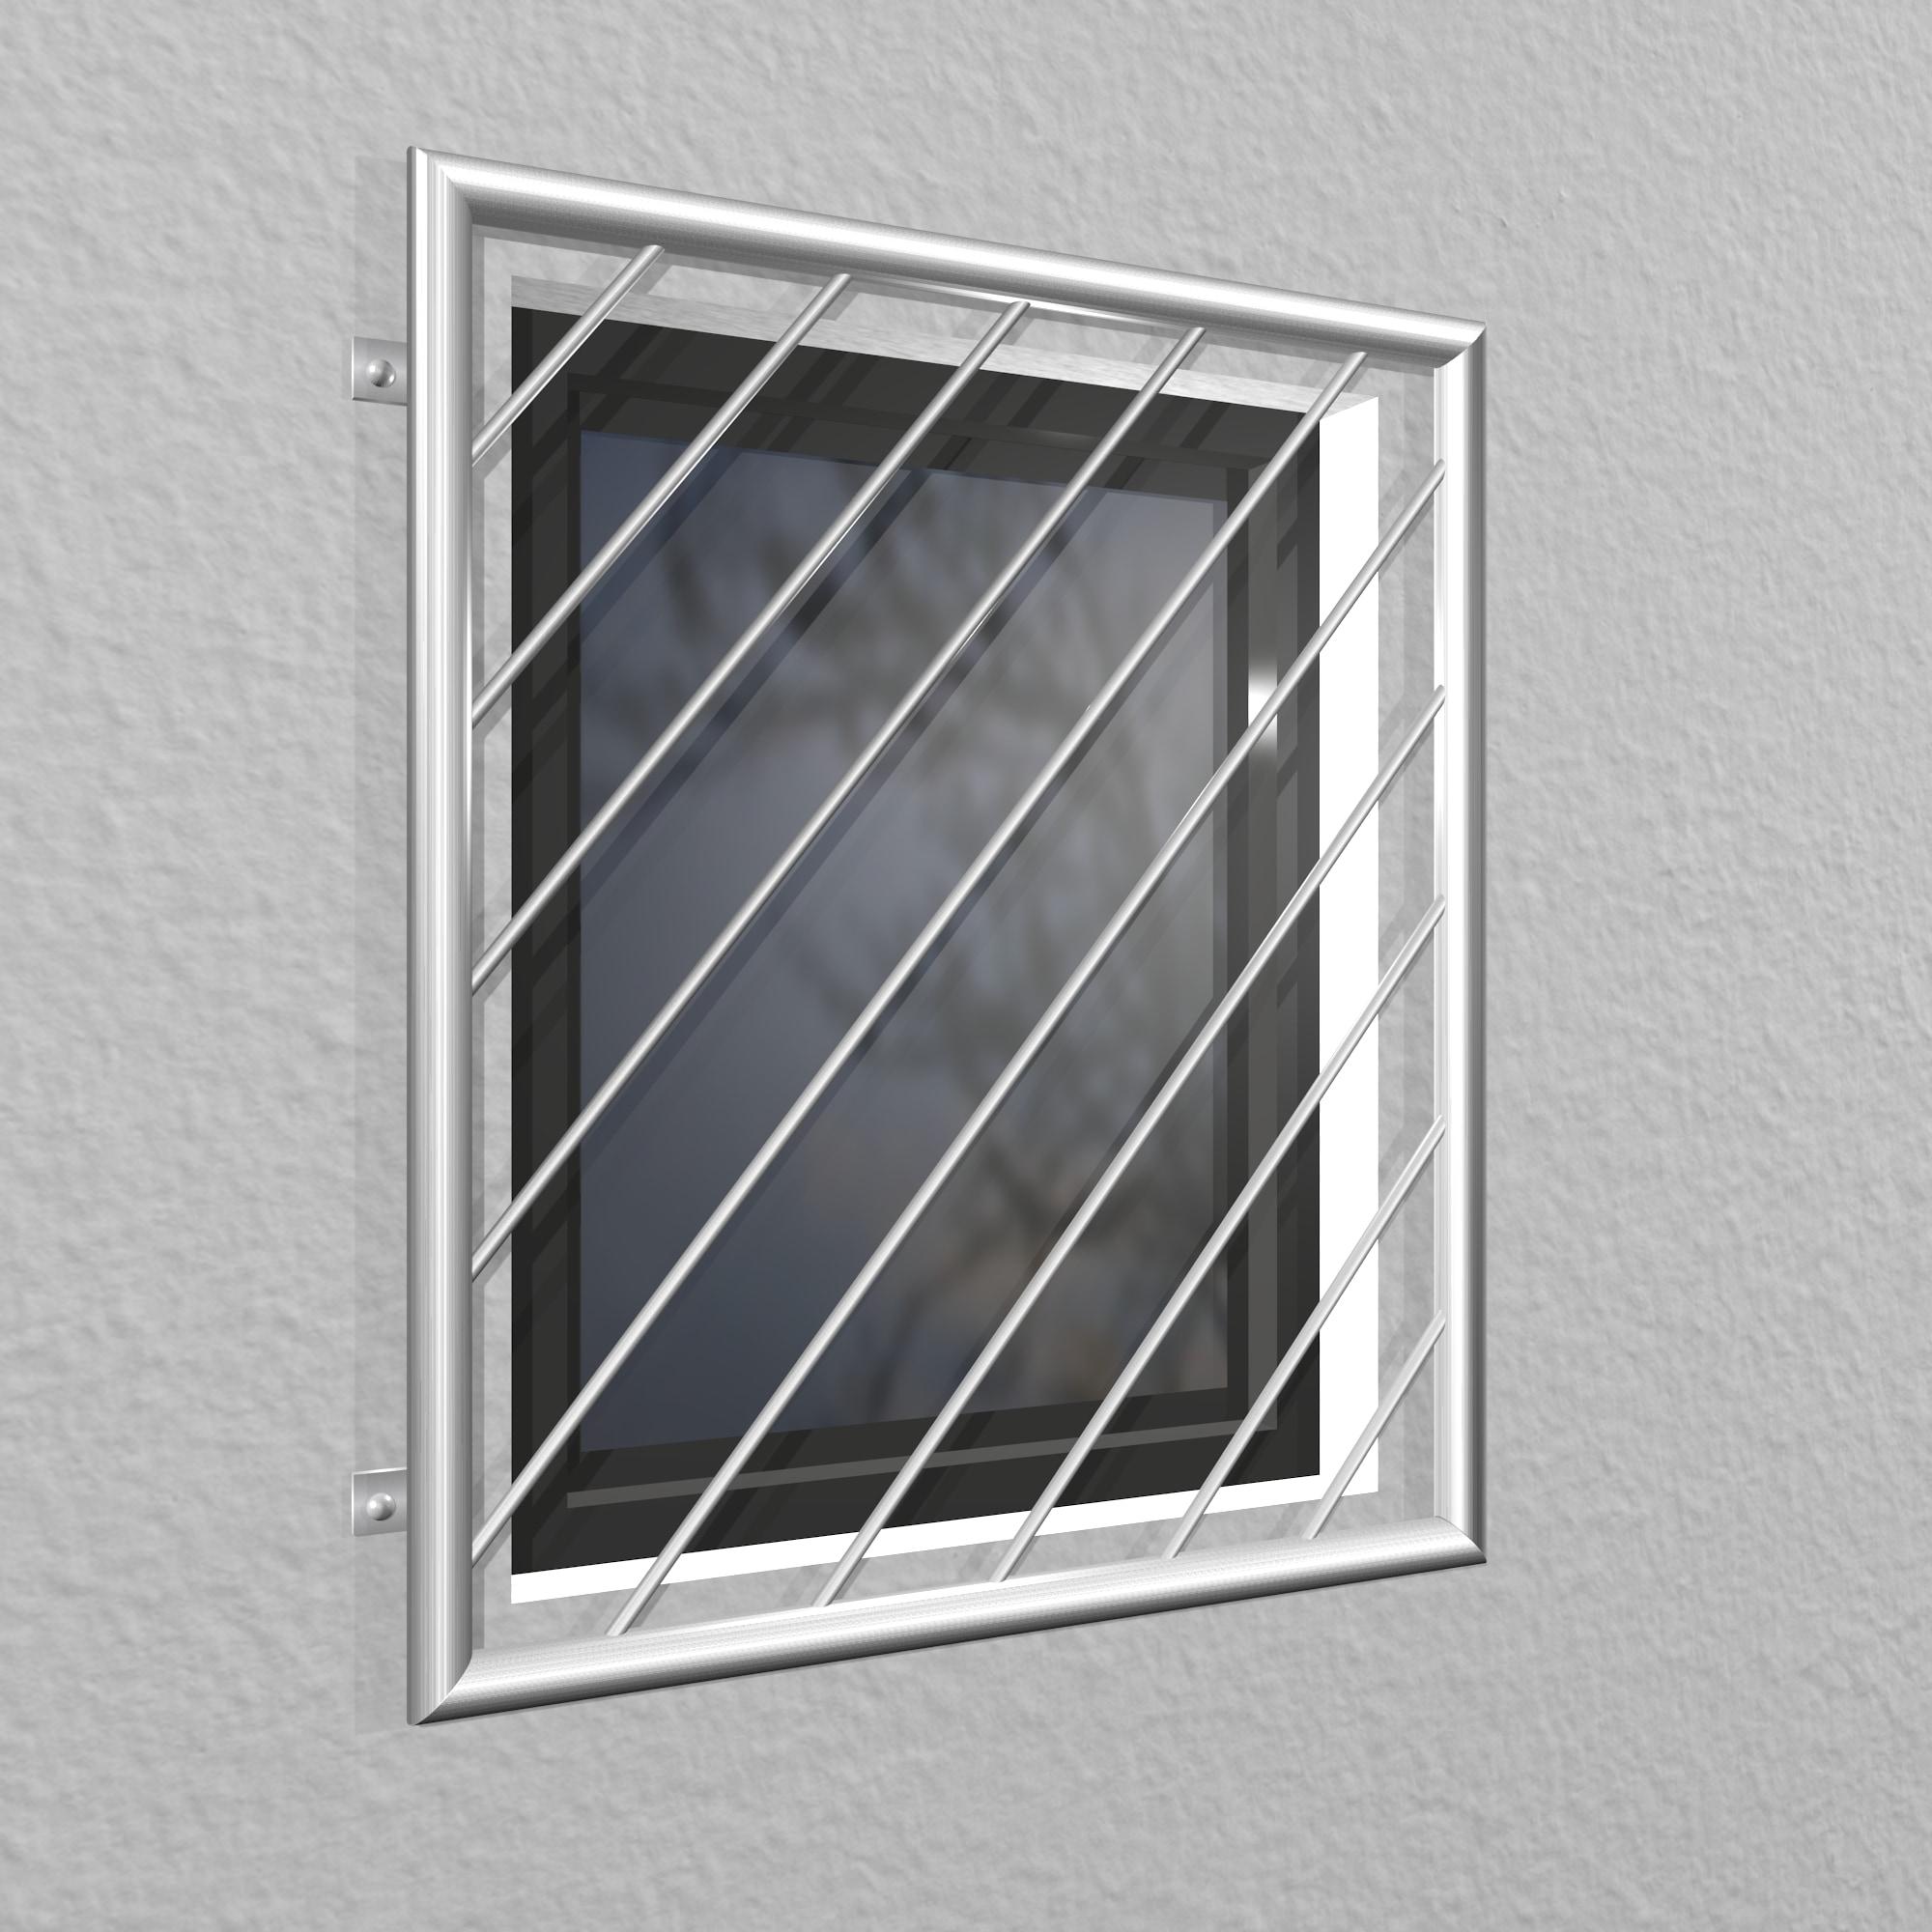 Fenstergitter Edelstahl Diagonalstab 1